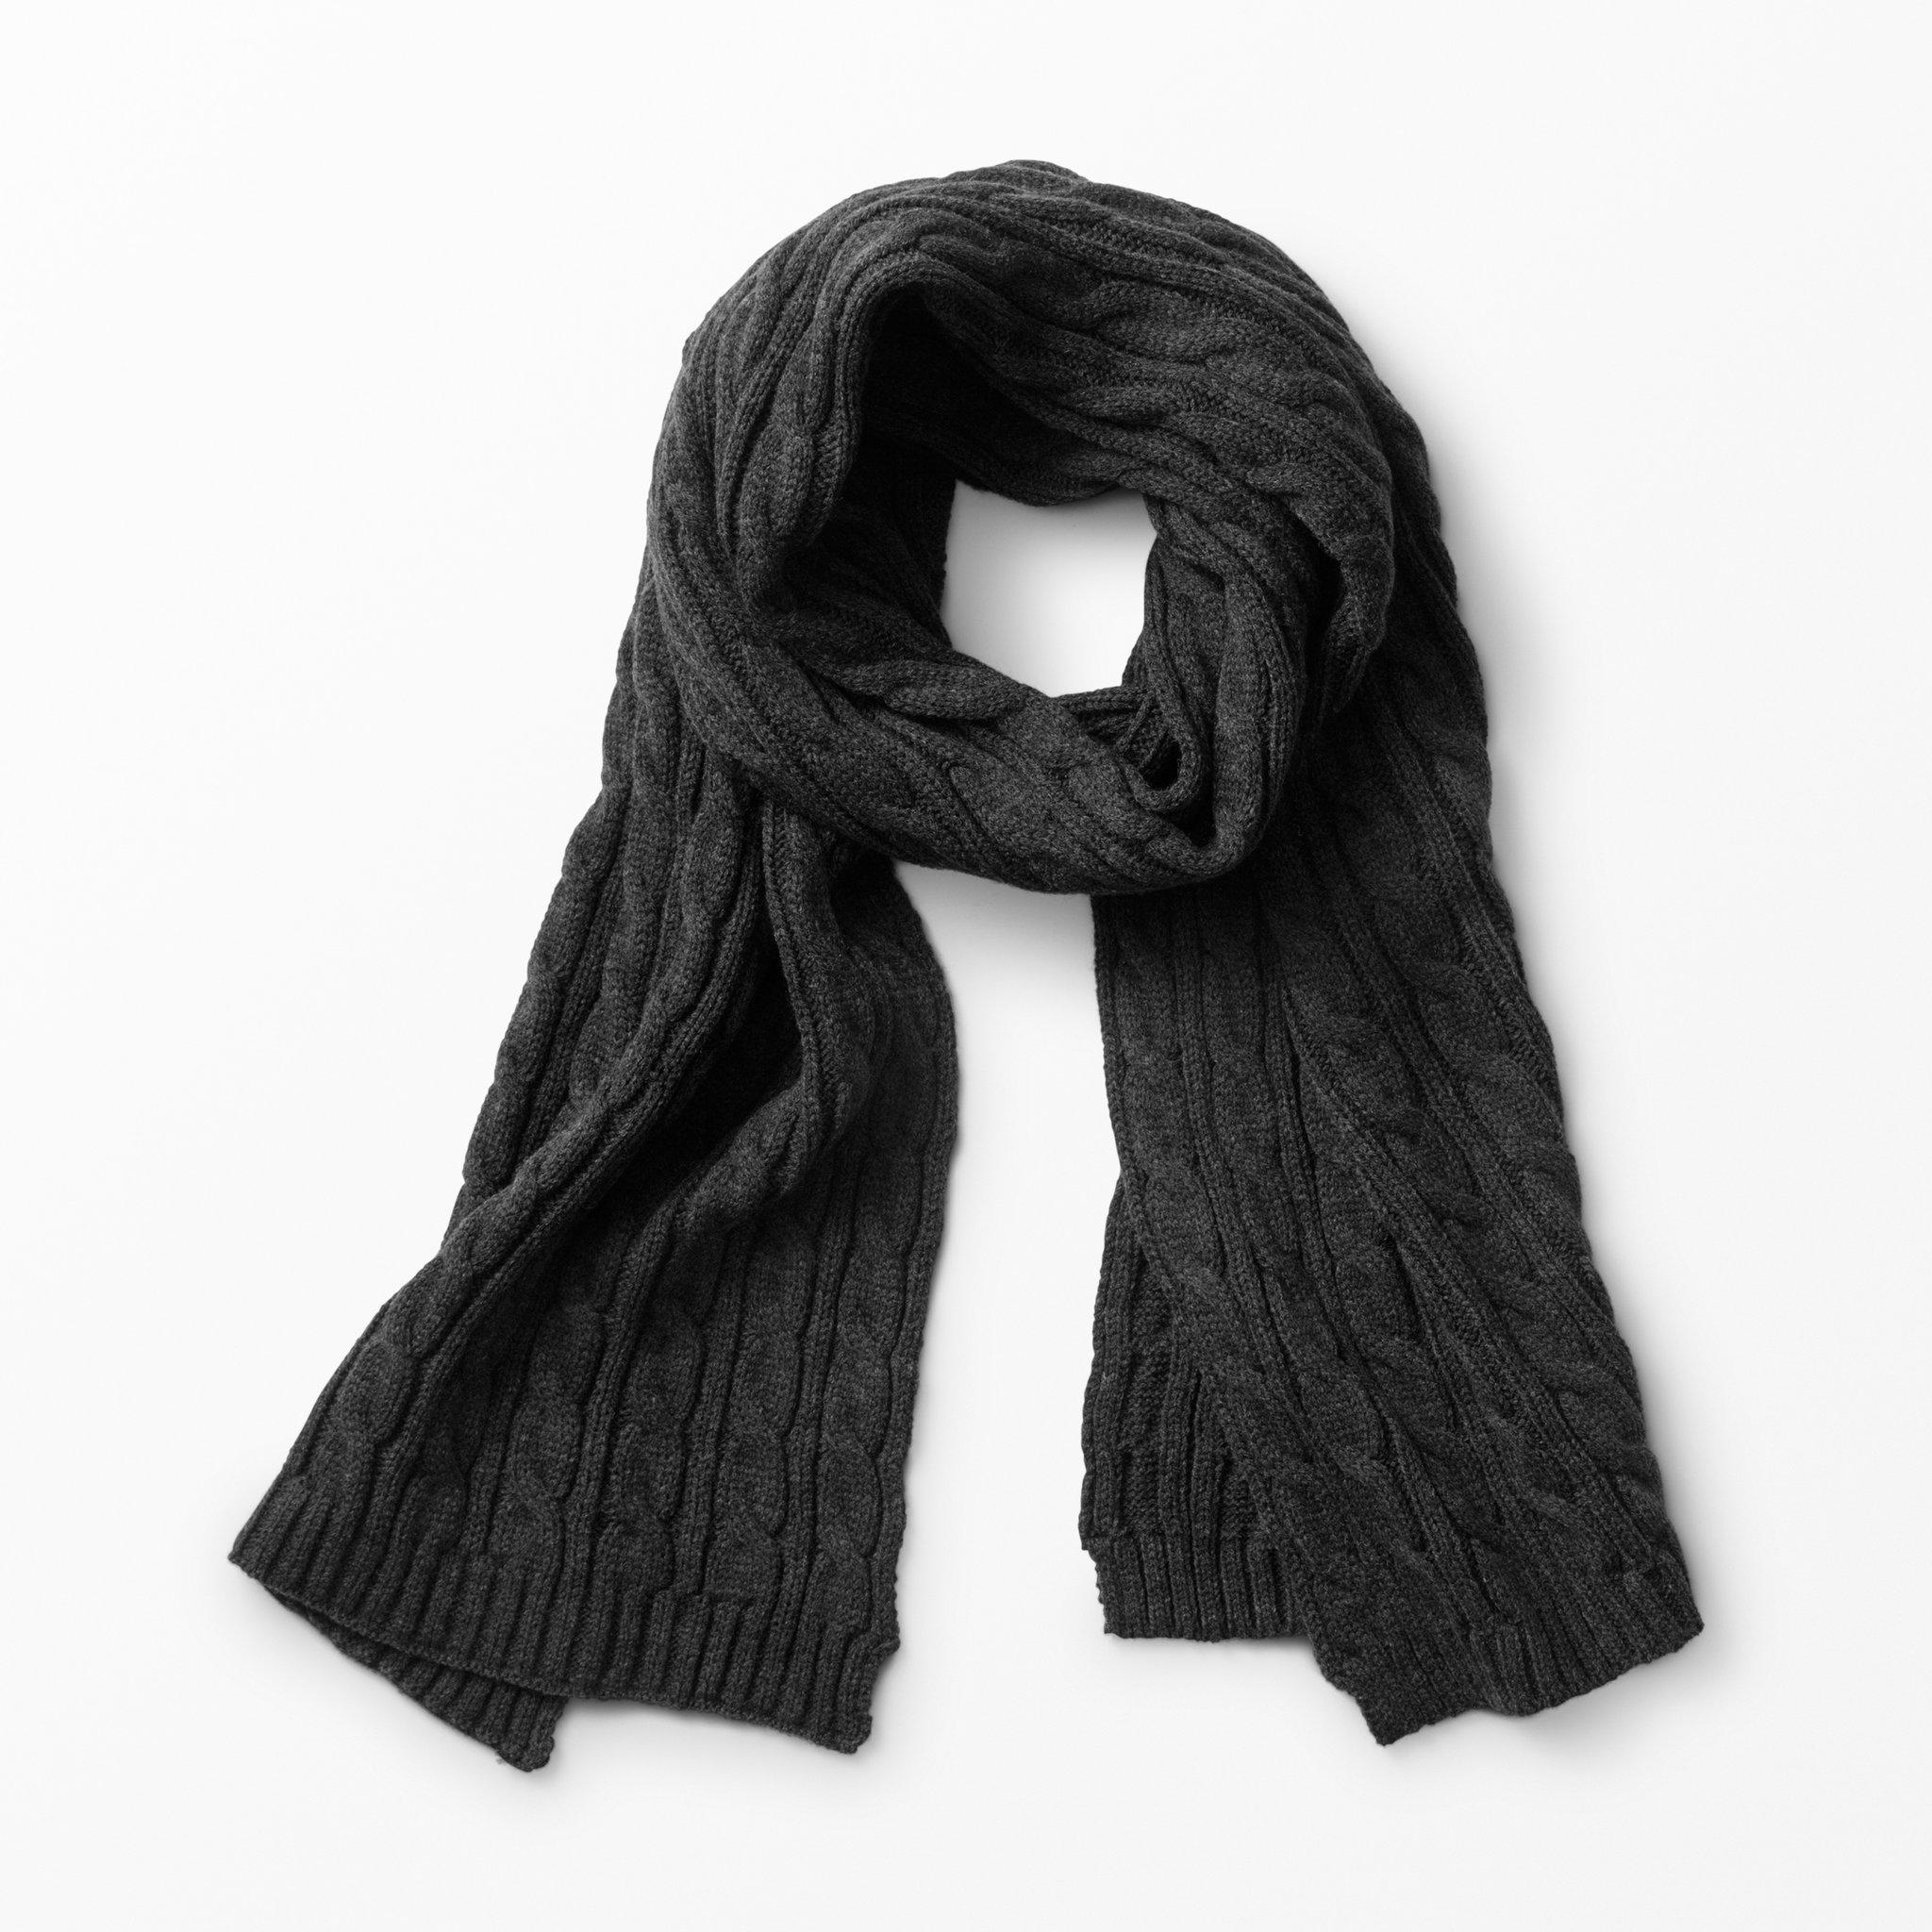 Halsduk kabelstickad - Halsdukar   scarves - Köp online på åhlens.se! cefb4578afab8